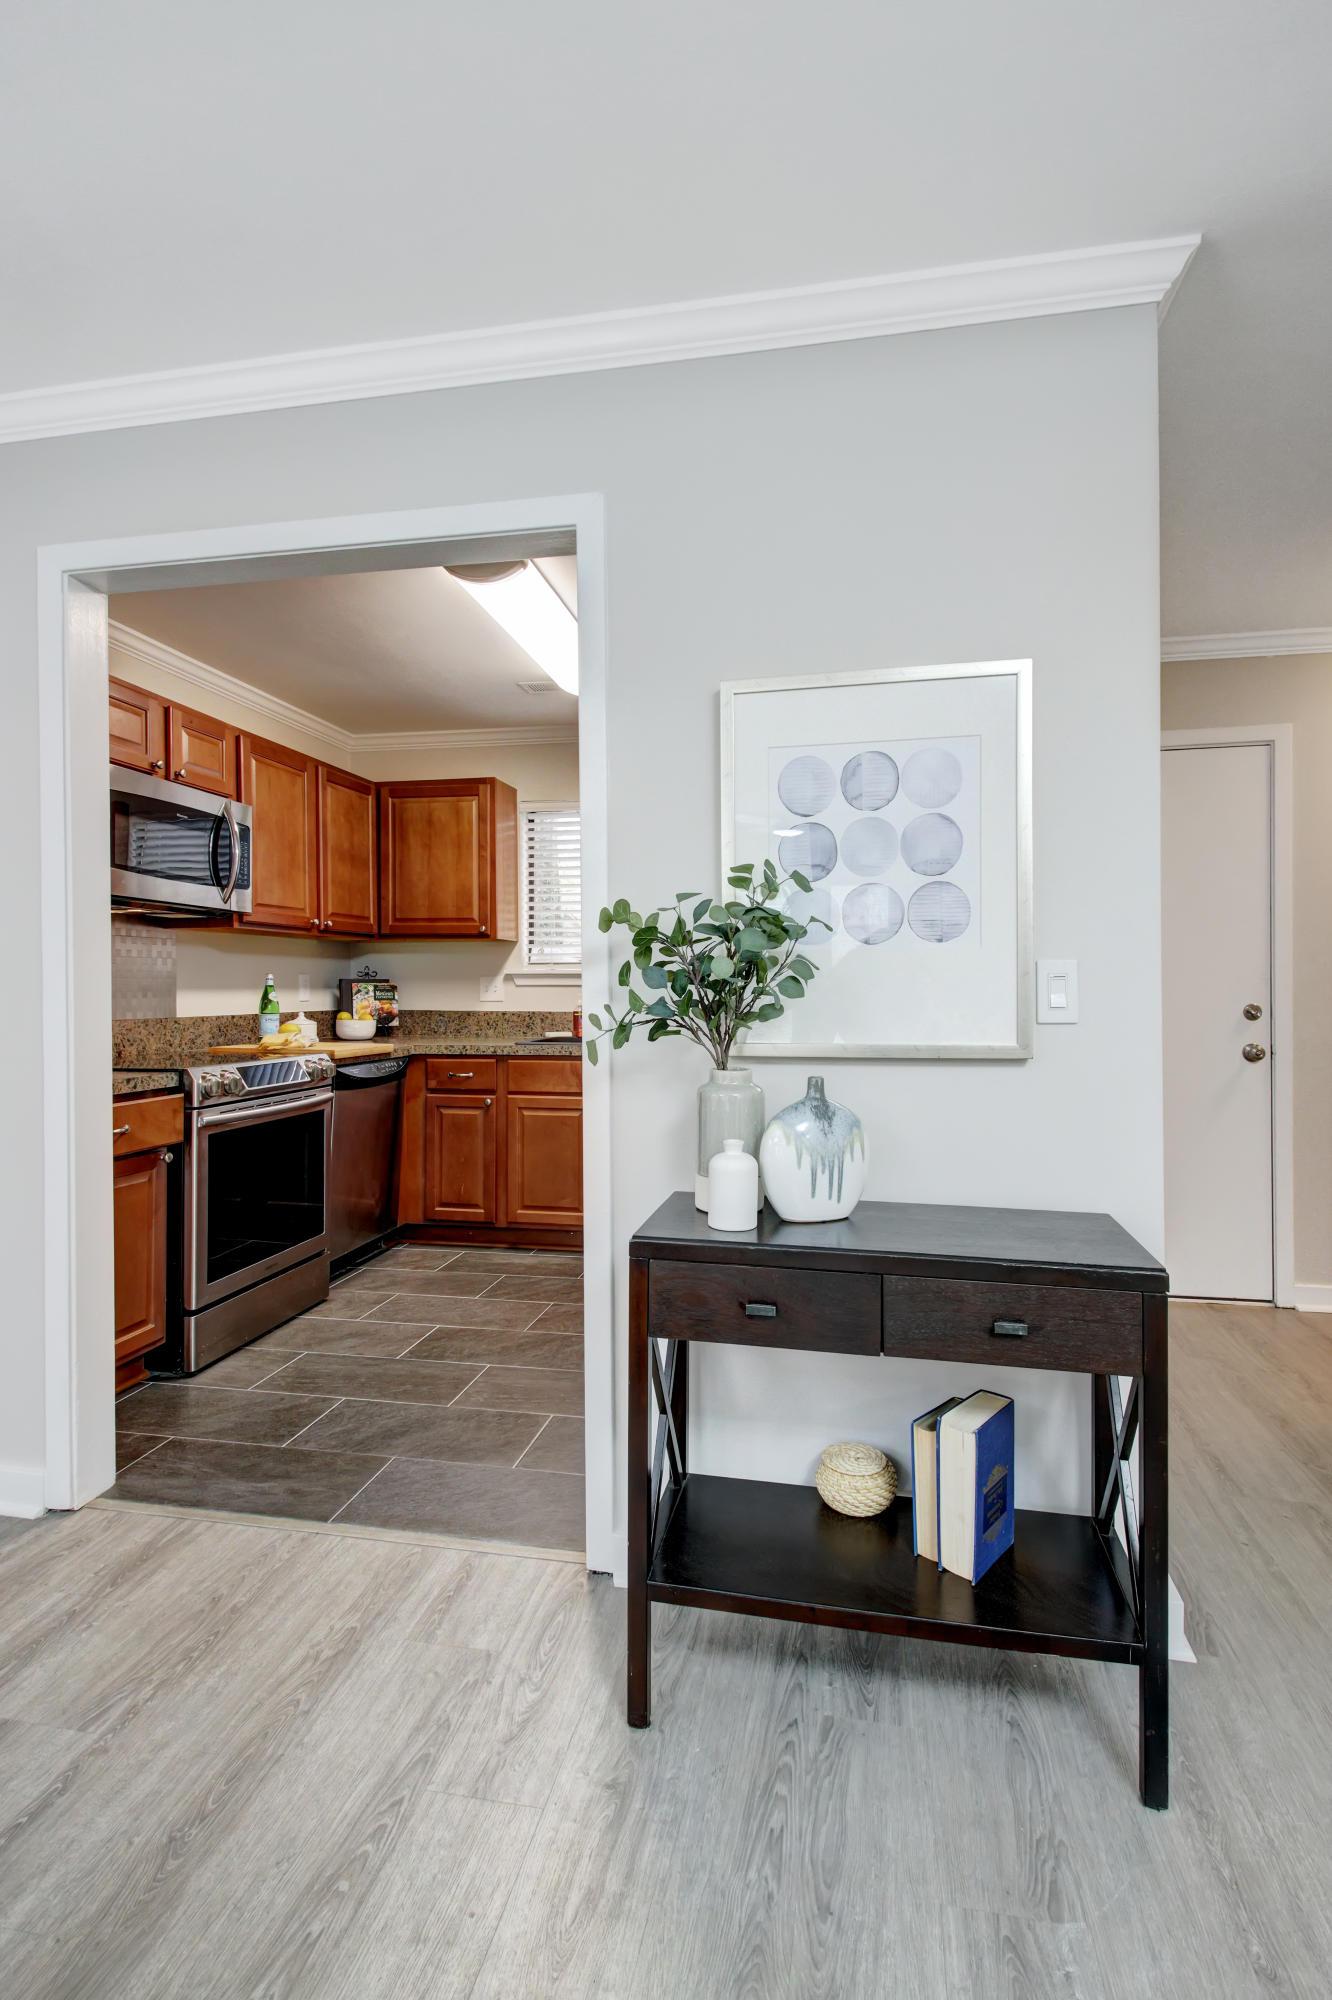 Sandpiper Pointe Homes For Sale - 335 Spoonbill, Mount Pleasant, SC - 13